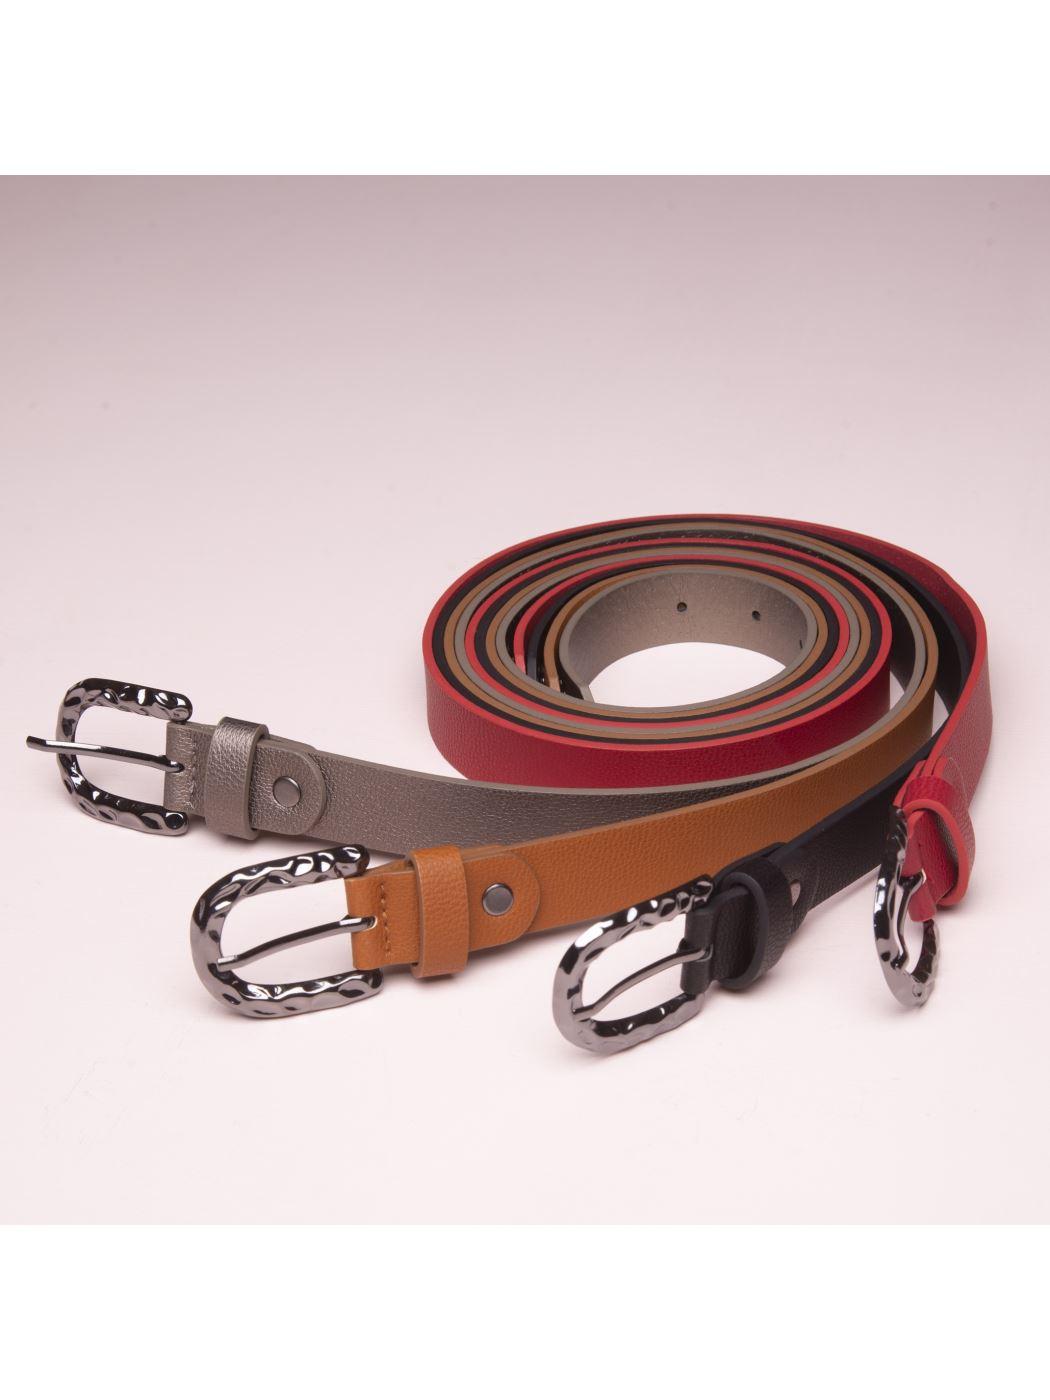 Cintura rigida con fibbia metallica ovale